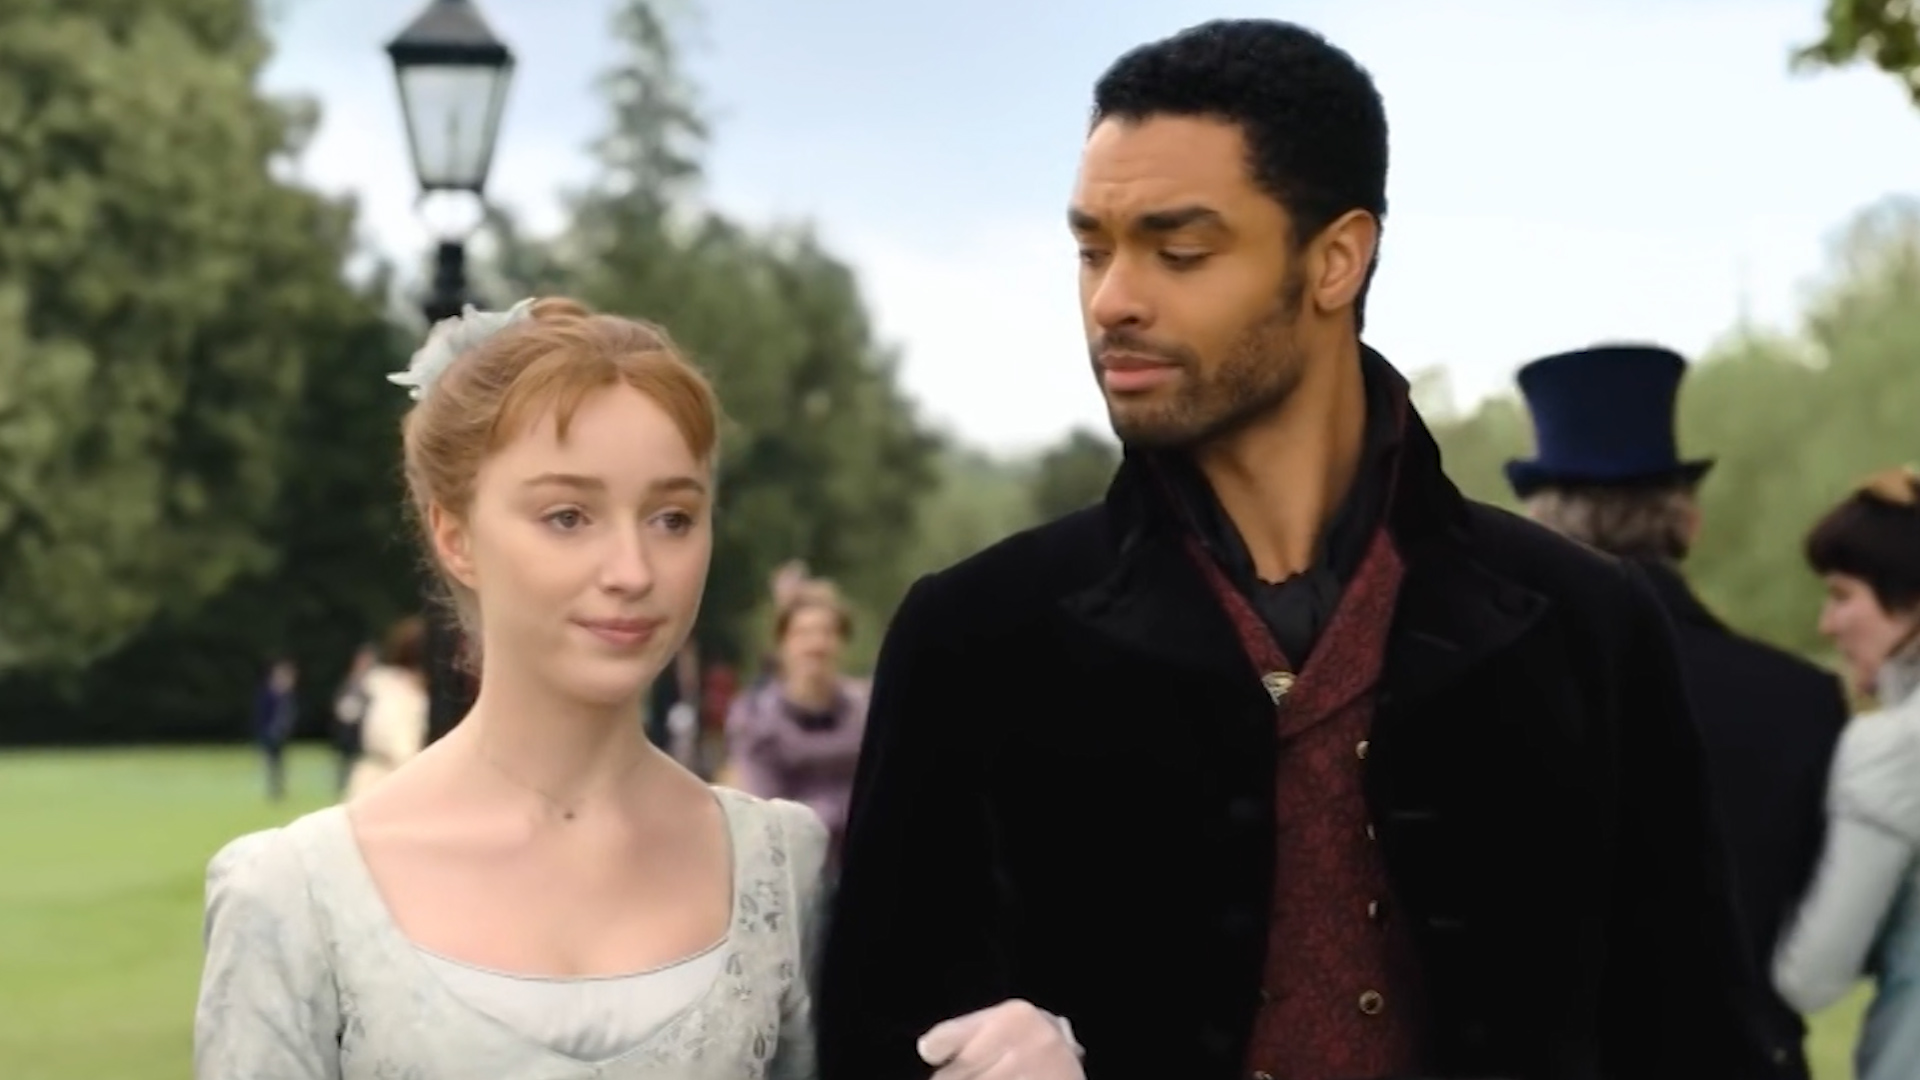 'Bridgerton' viewers spot a historical mistake in scenes